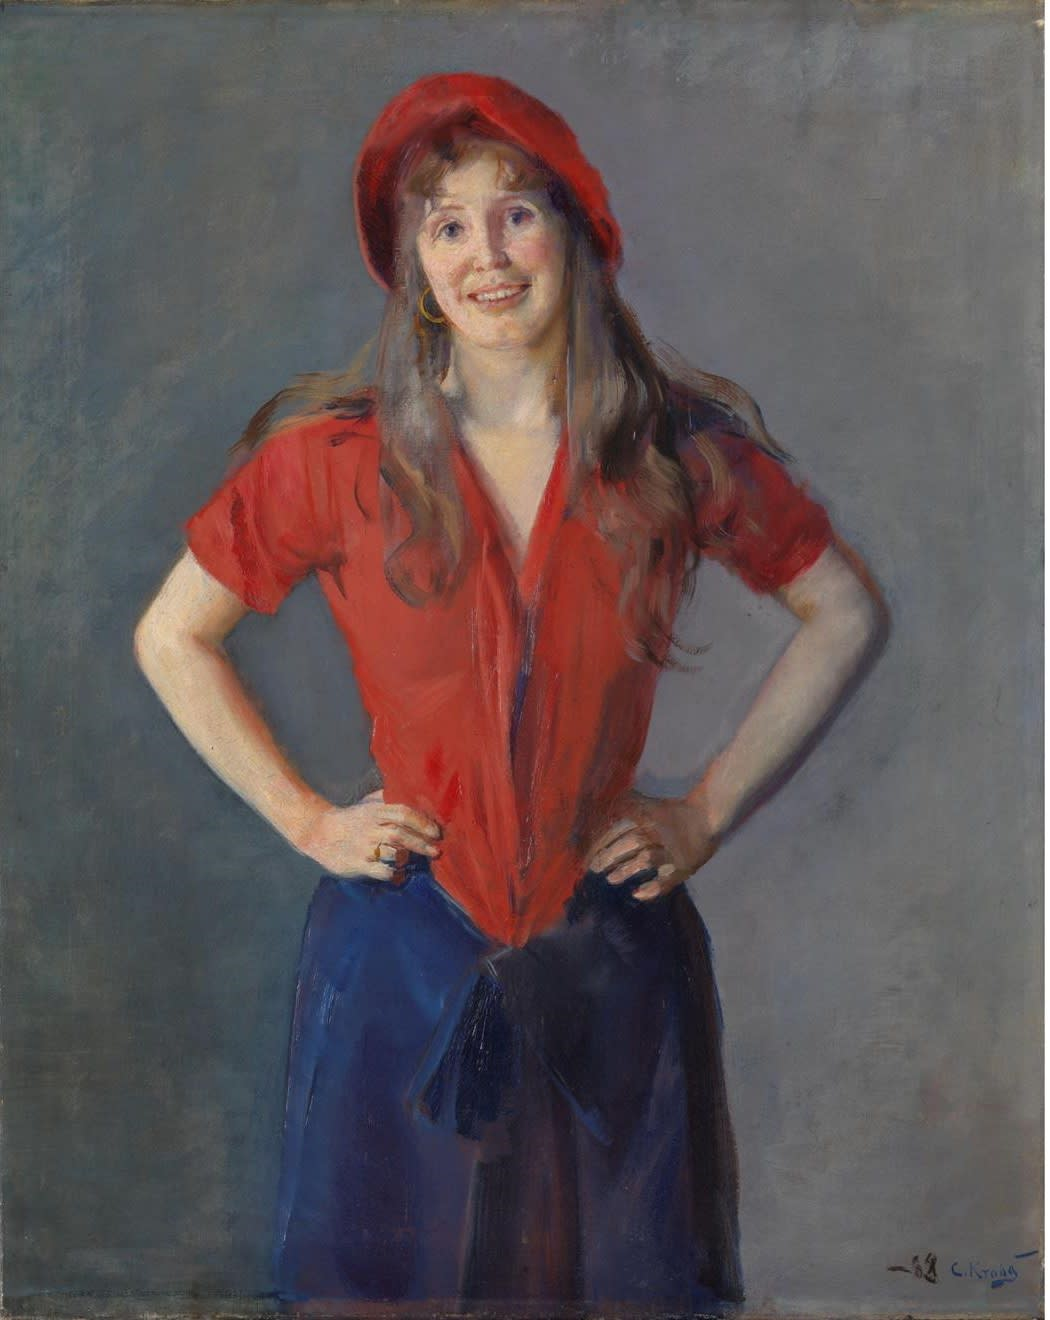 Portrait of the Painter Oda Krohg